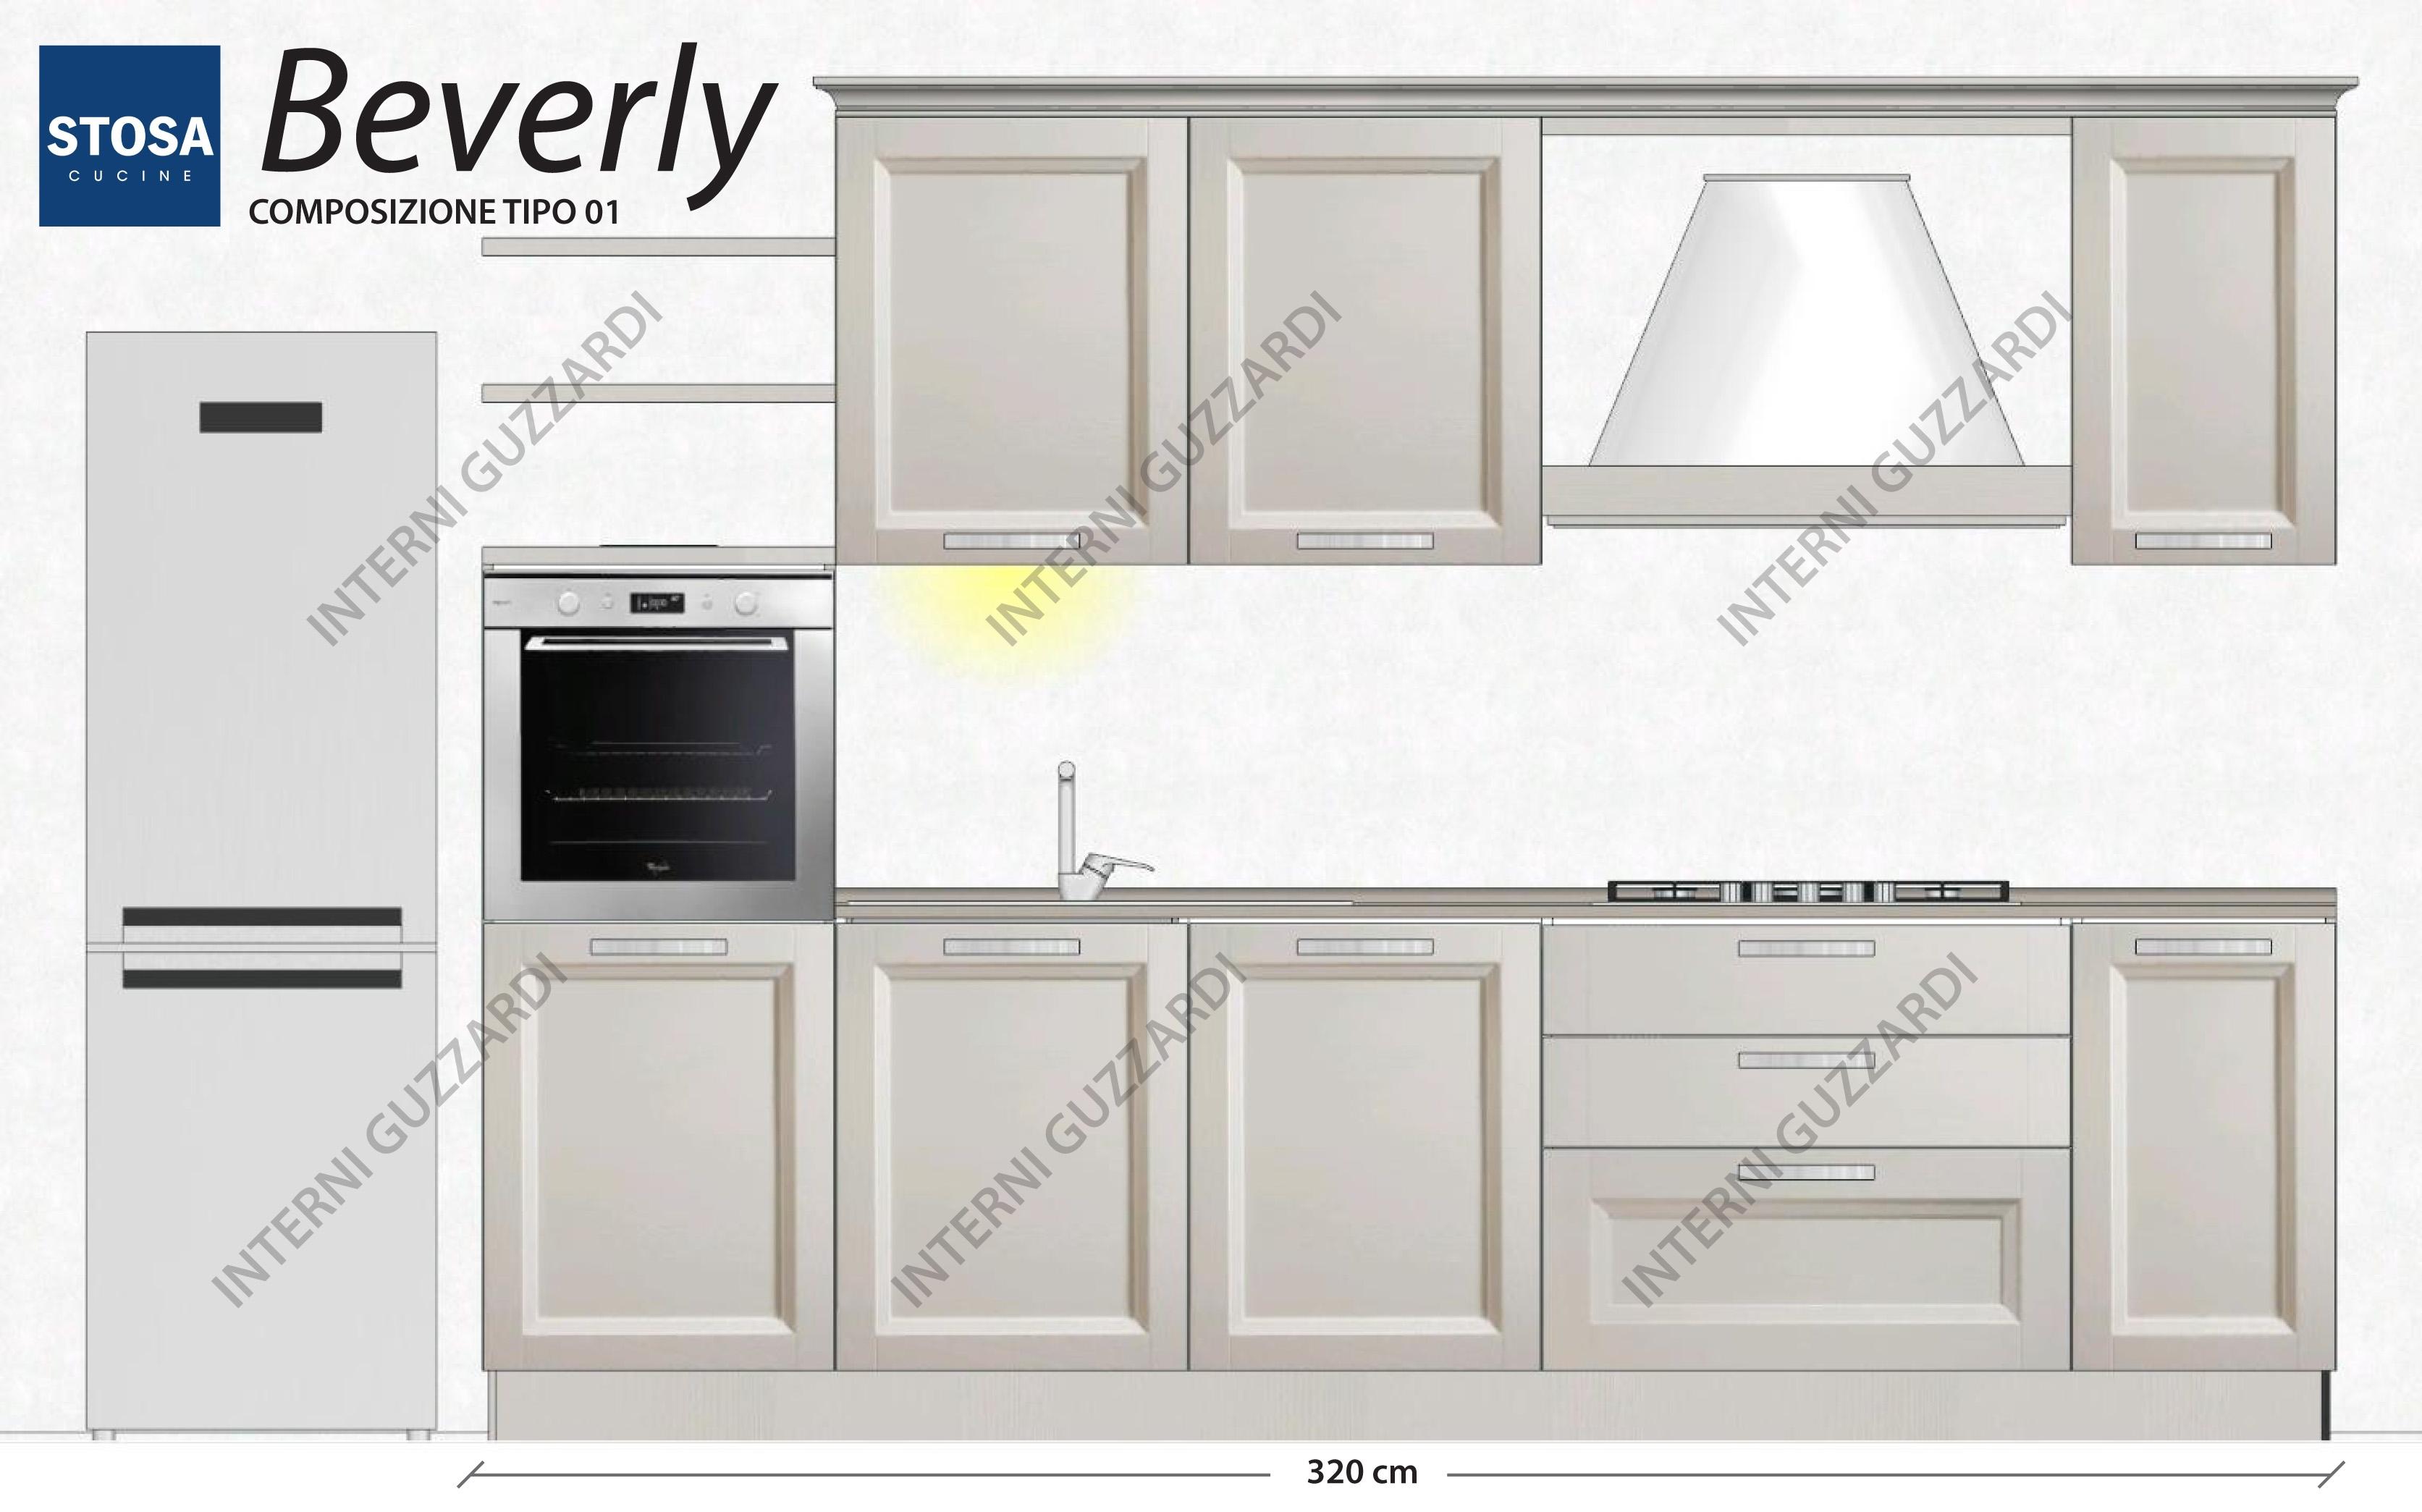 cucina stosa cucine beverly composizione tipo 01 a 6750